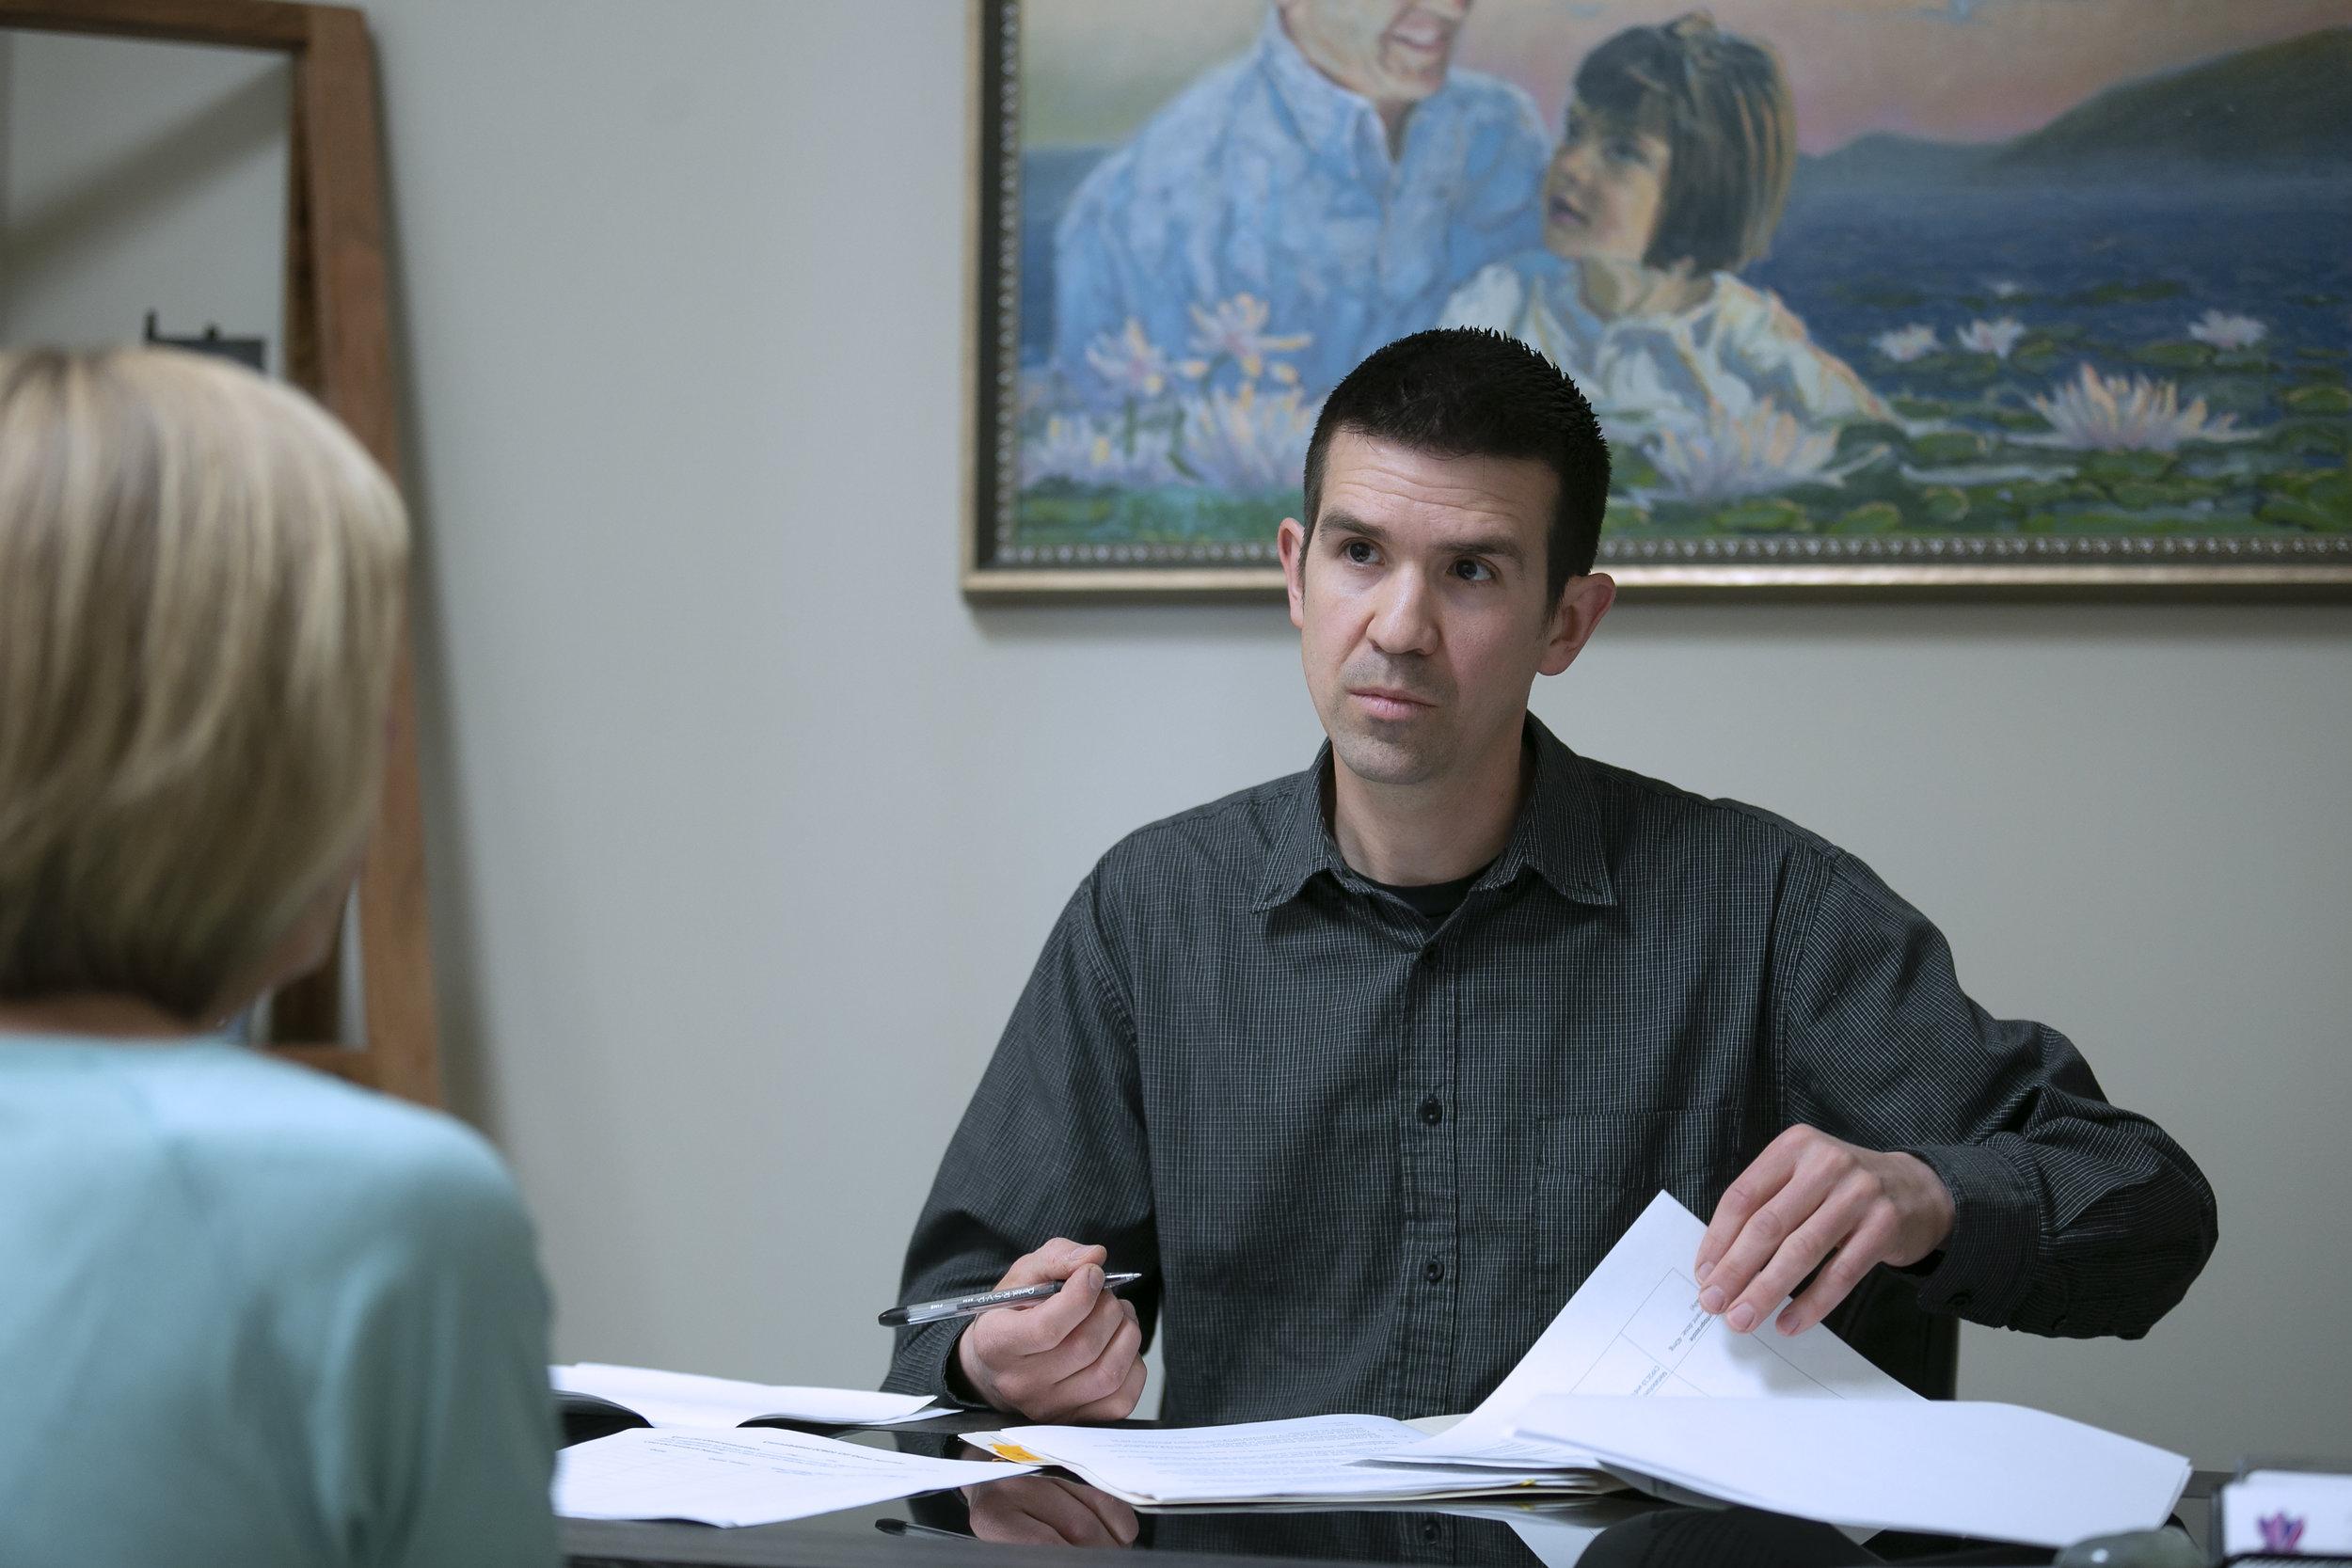 Tim Dyer - Registered Pharmacist/ Medical Cannabis Consultant